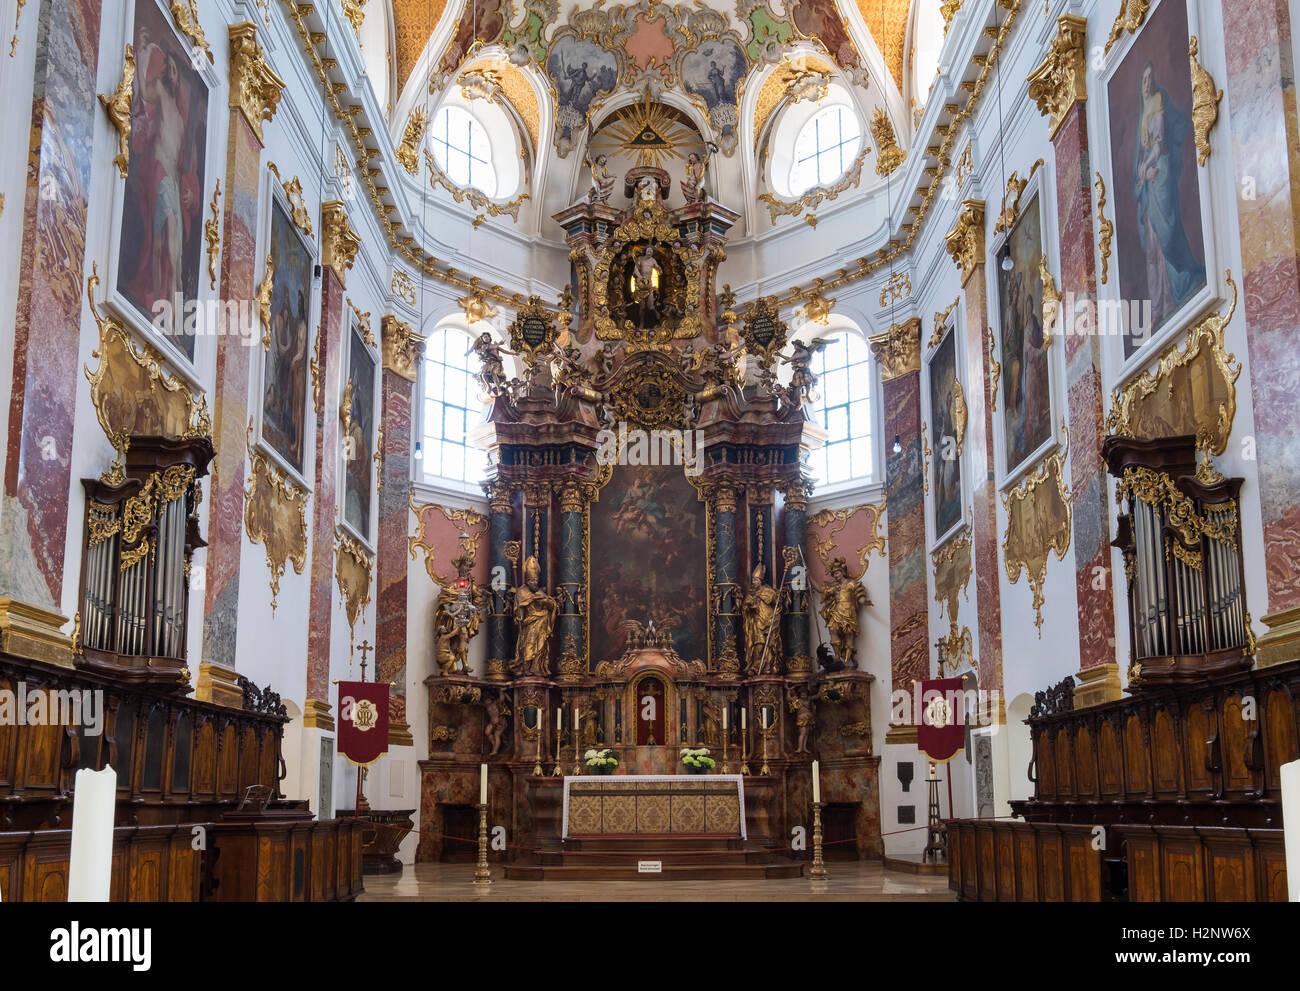 Main altar, parish church of St. Martinus and Maria, Biberach an der Riss, Upper Swabia, Swabia, Baden-Württemberg, - Stock Image